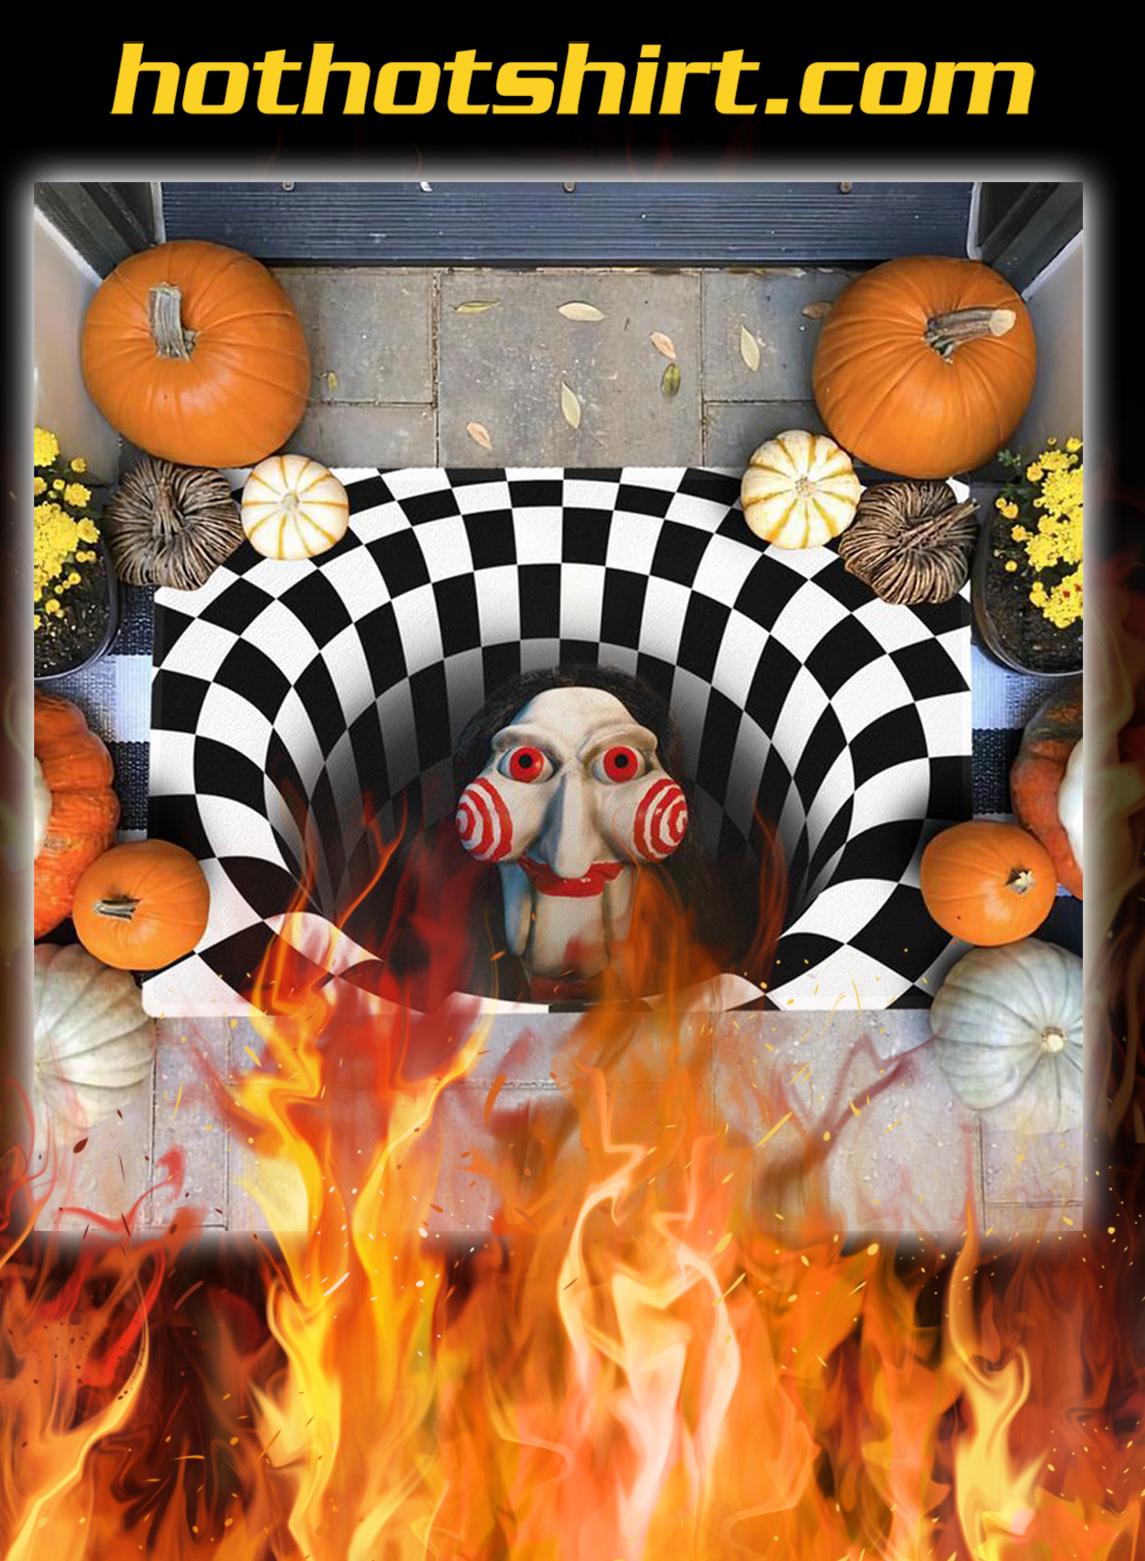 Billy jigsaw illusion halloween doormat- pic 1